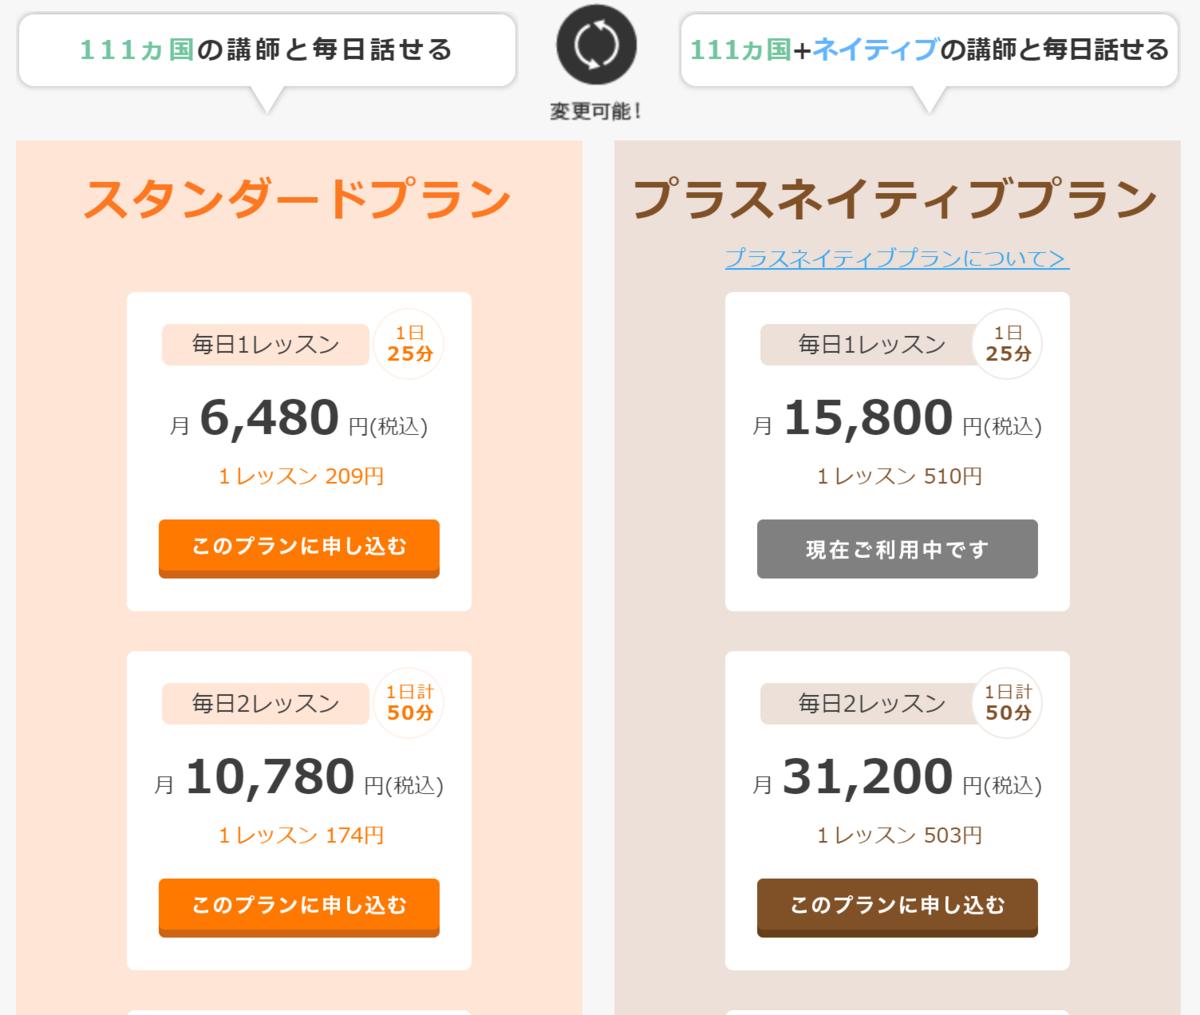 f:id:kirito1007:20200201015929p:plain